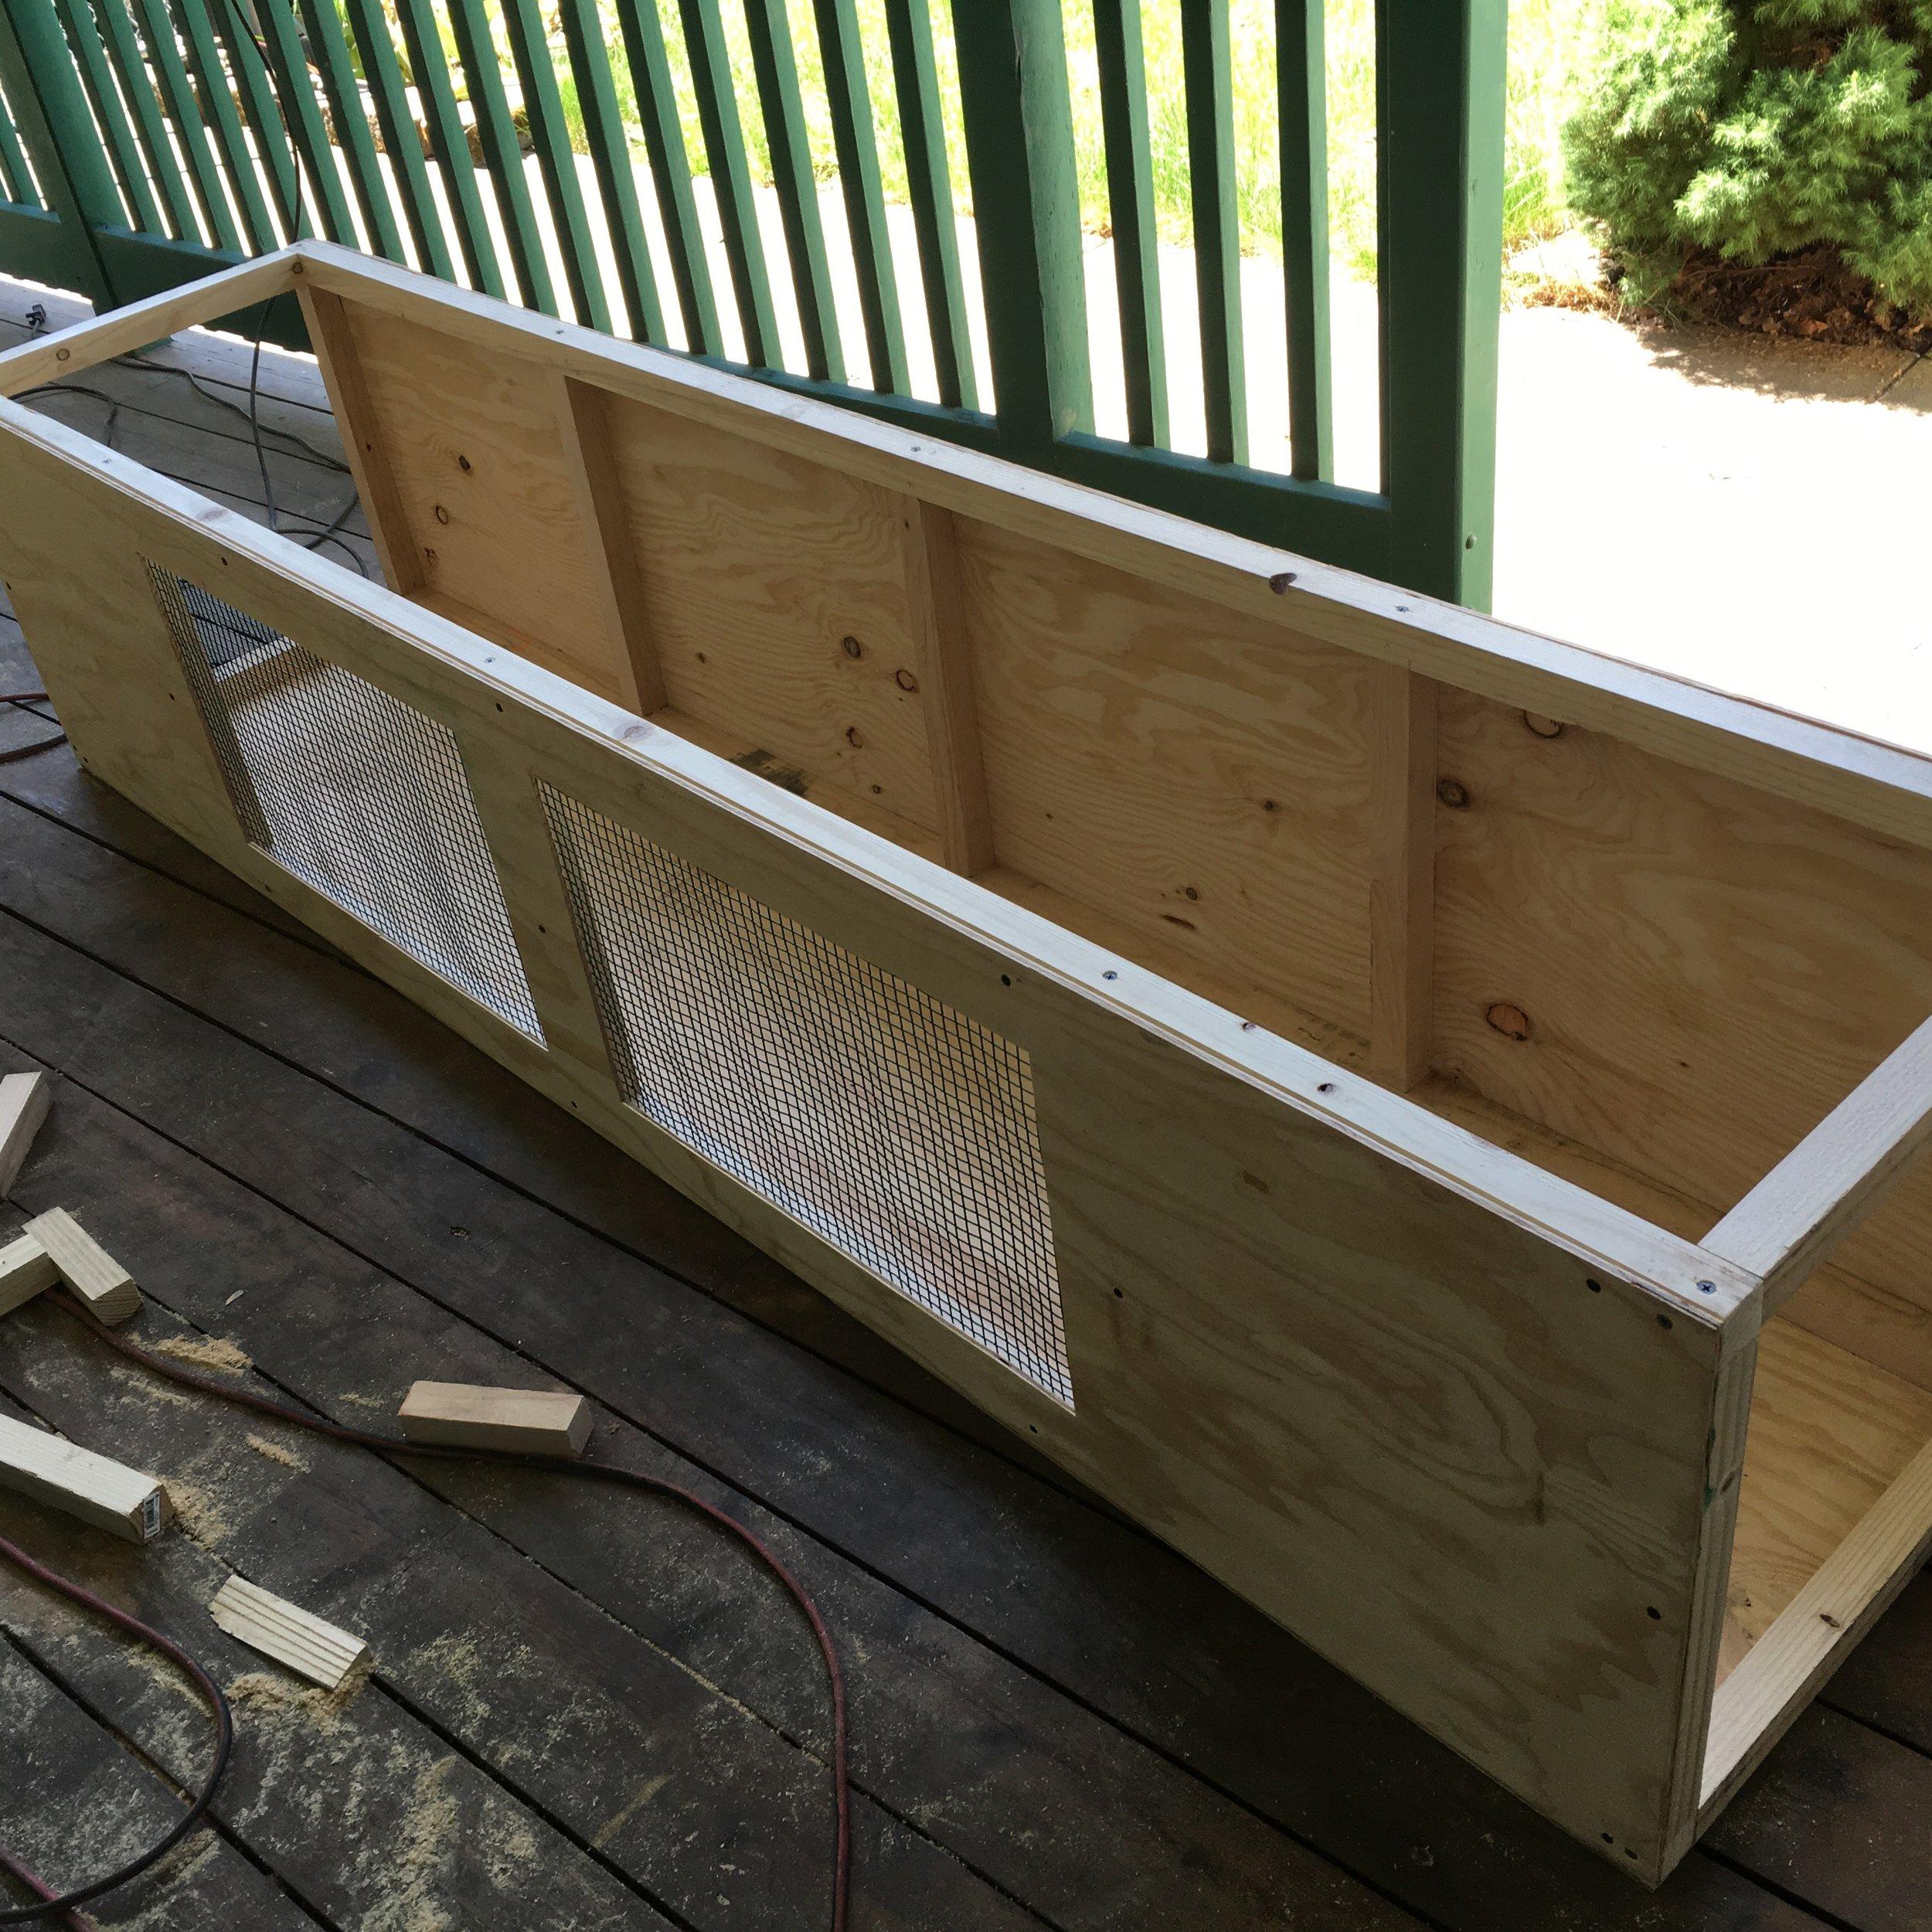 Frame is built